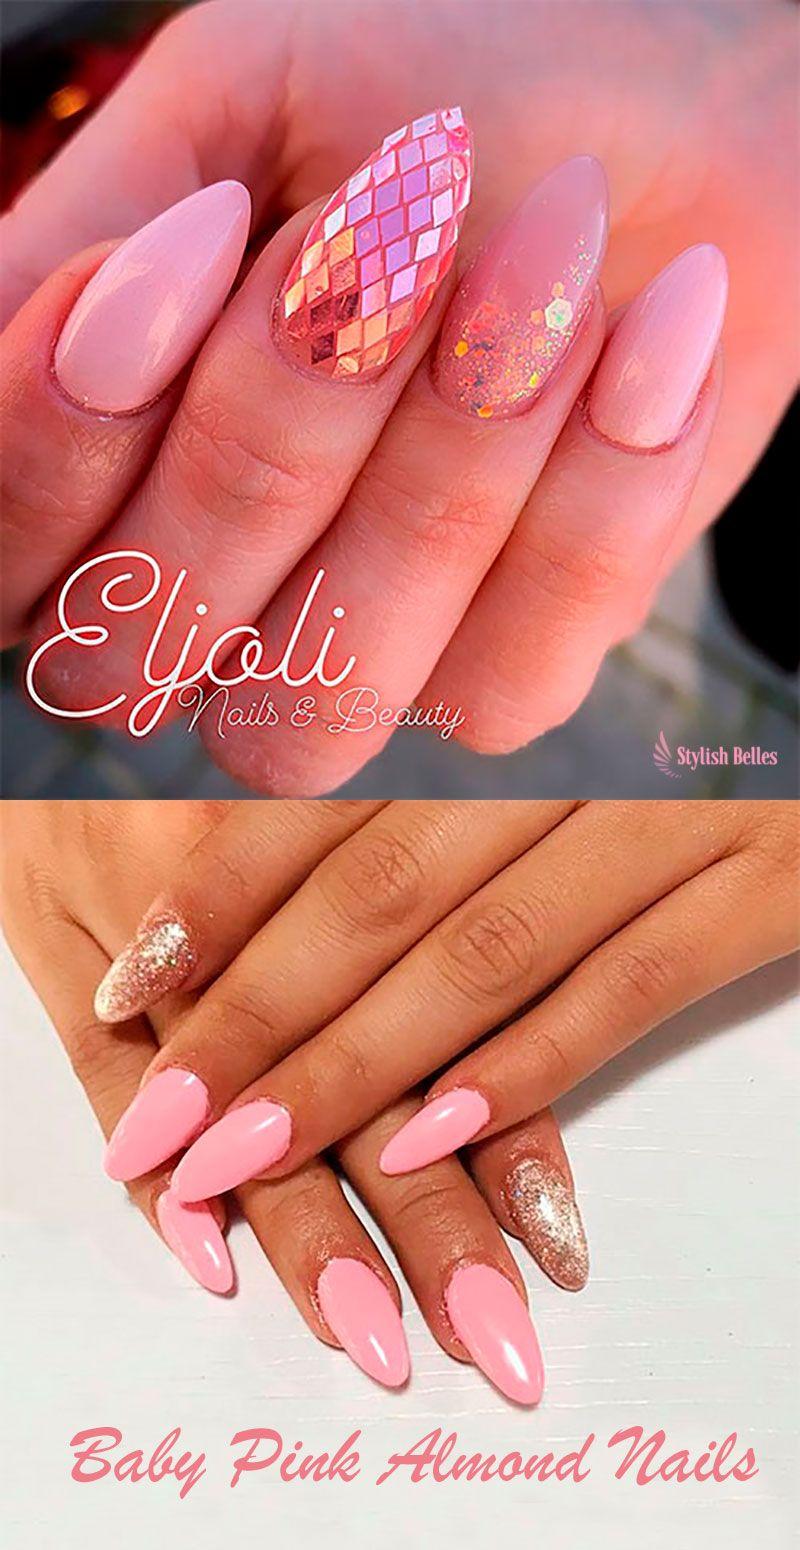 Cute Baby Pink Almond Nails Ideas In 2019 Shiny Nails Designs Nail Designs Stylish Nails Art